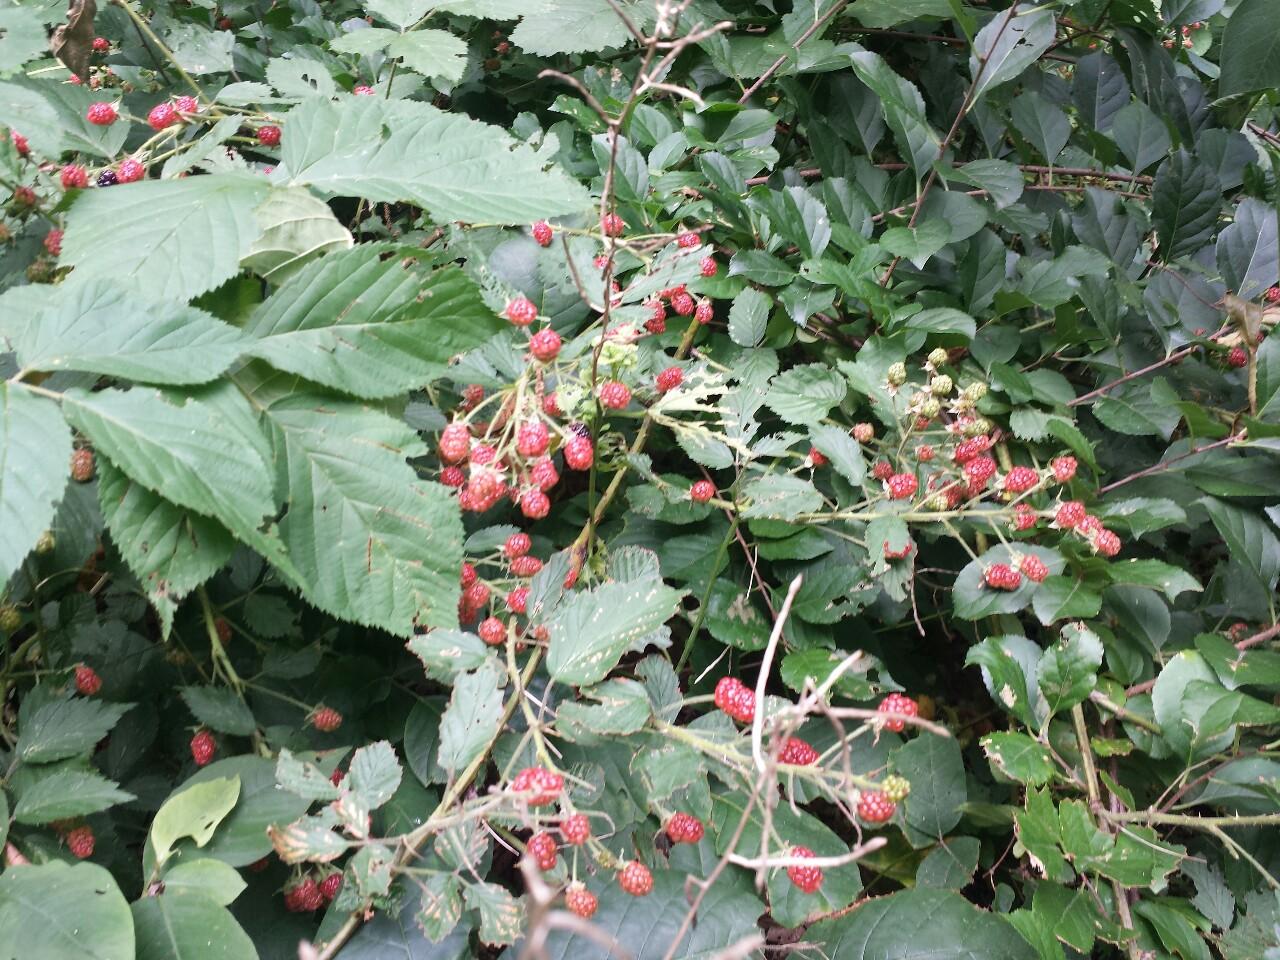 Unripe Strawberries Summer Foraging...